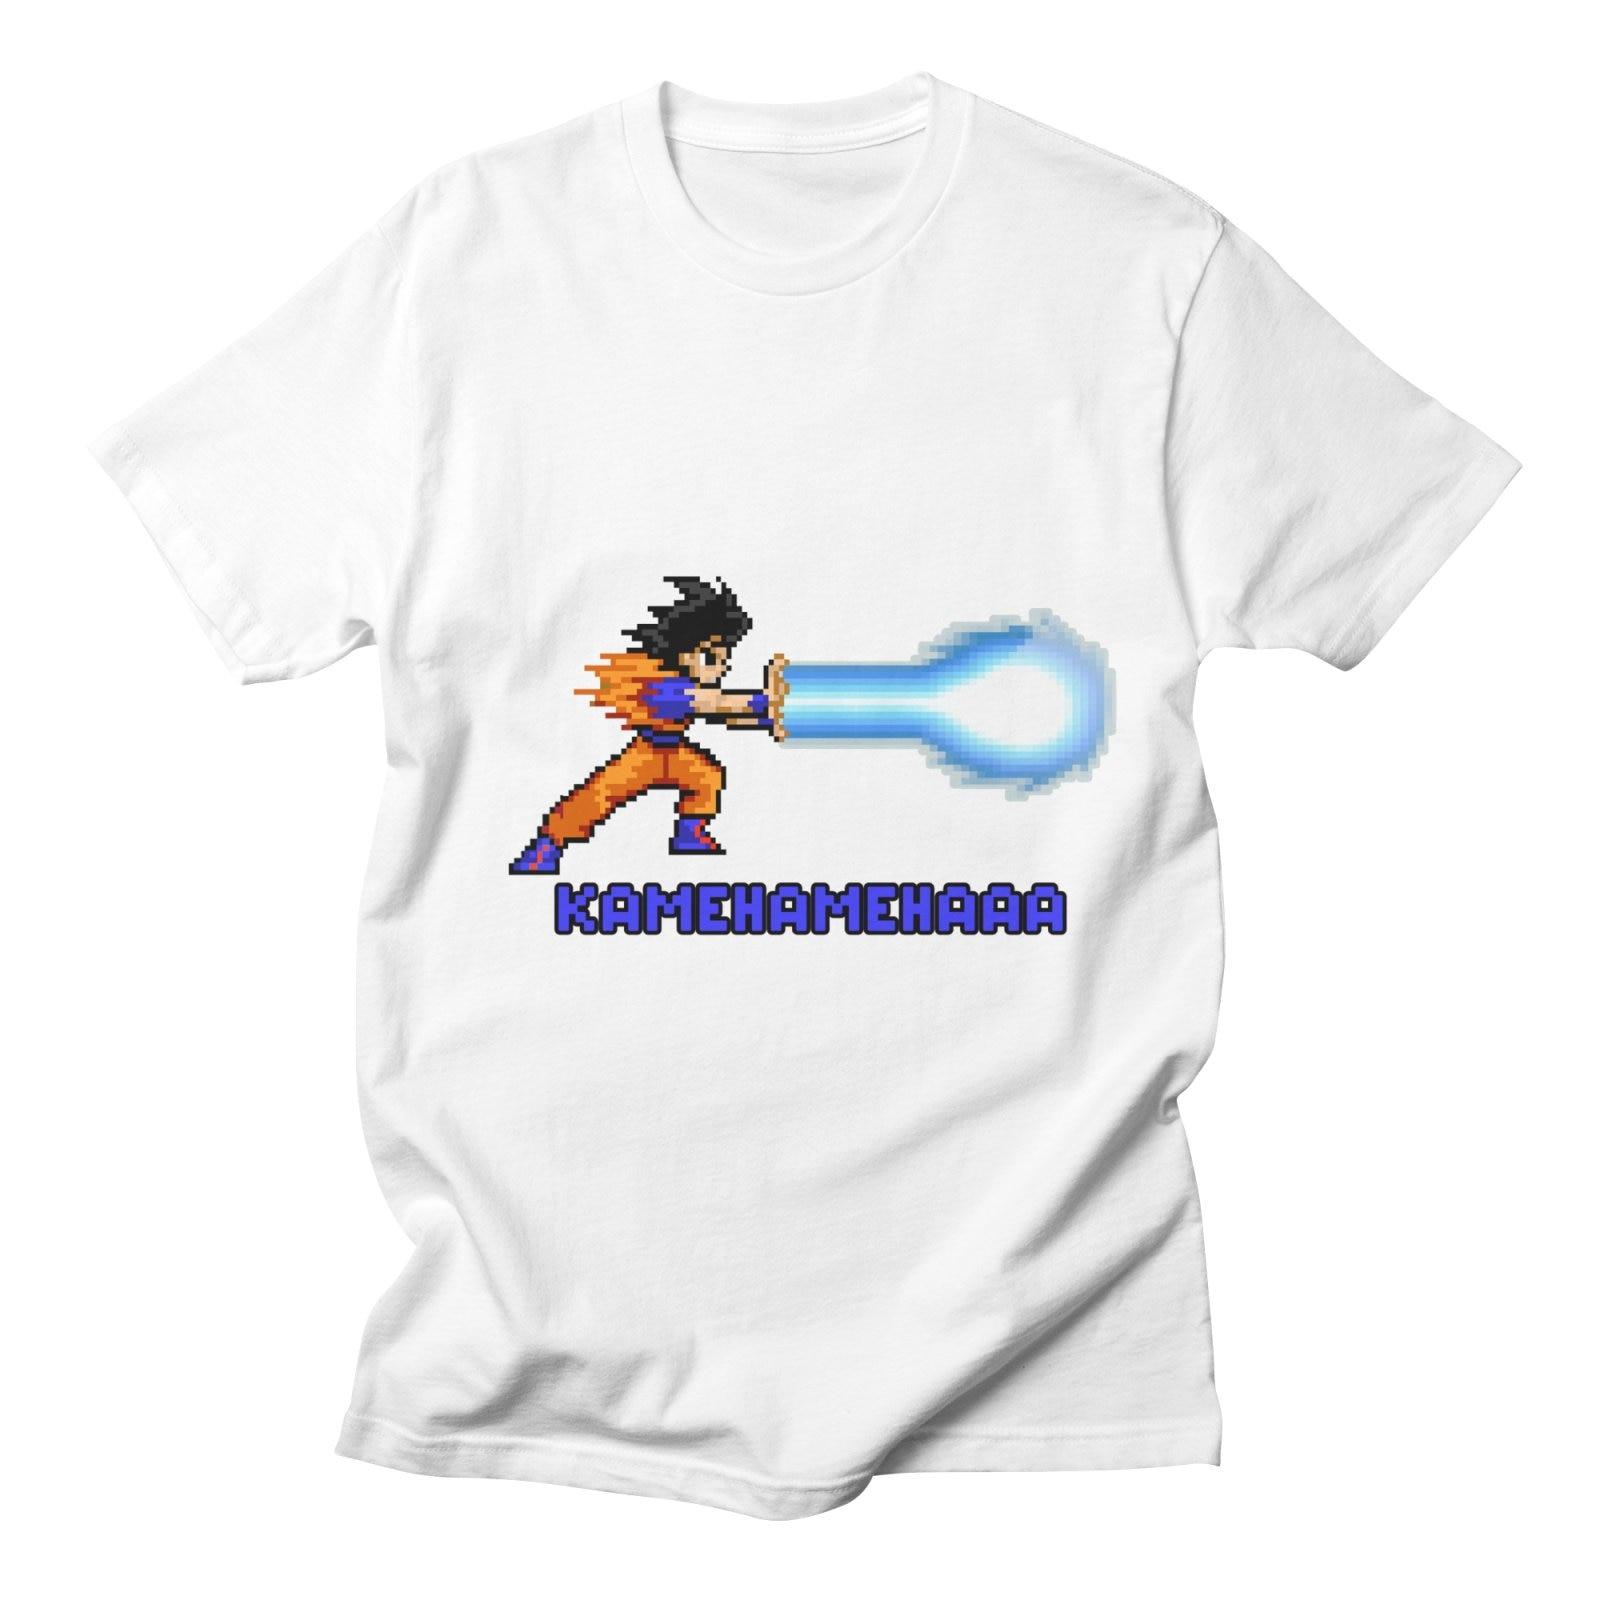 Dragon Ball T Shirt Men Short Sleeve Goku Costume Japanese Anime Fashion Casual Streetwear Harajuku High Quality Funny T Shirts